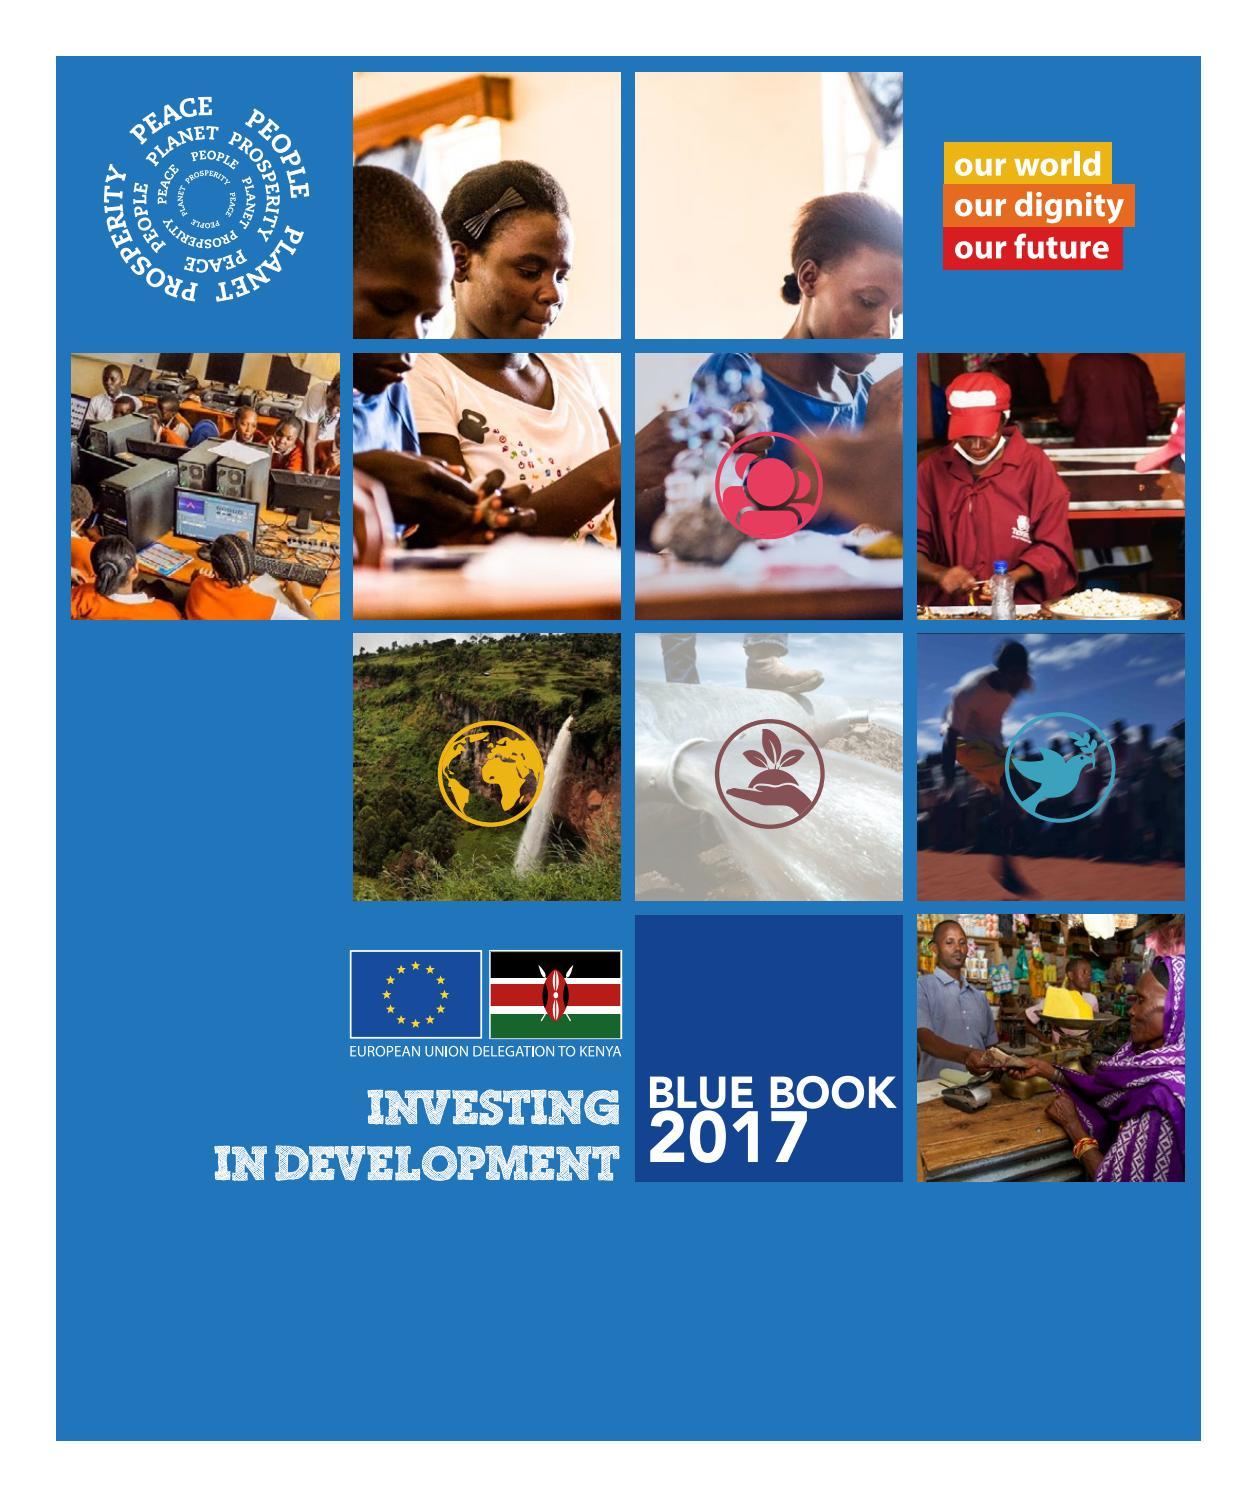 Blue book 2017 by Slovak Agency for International